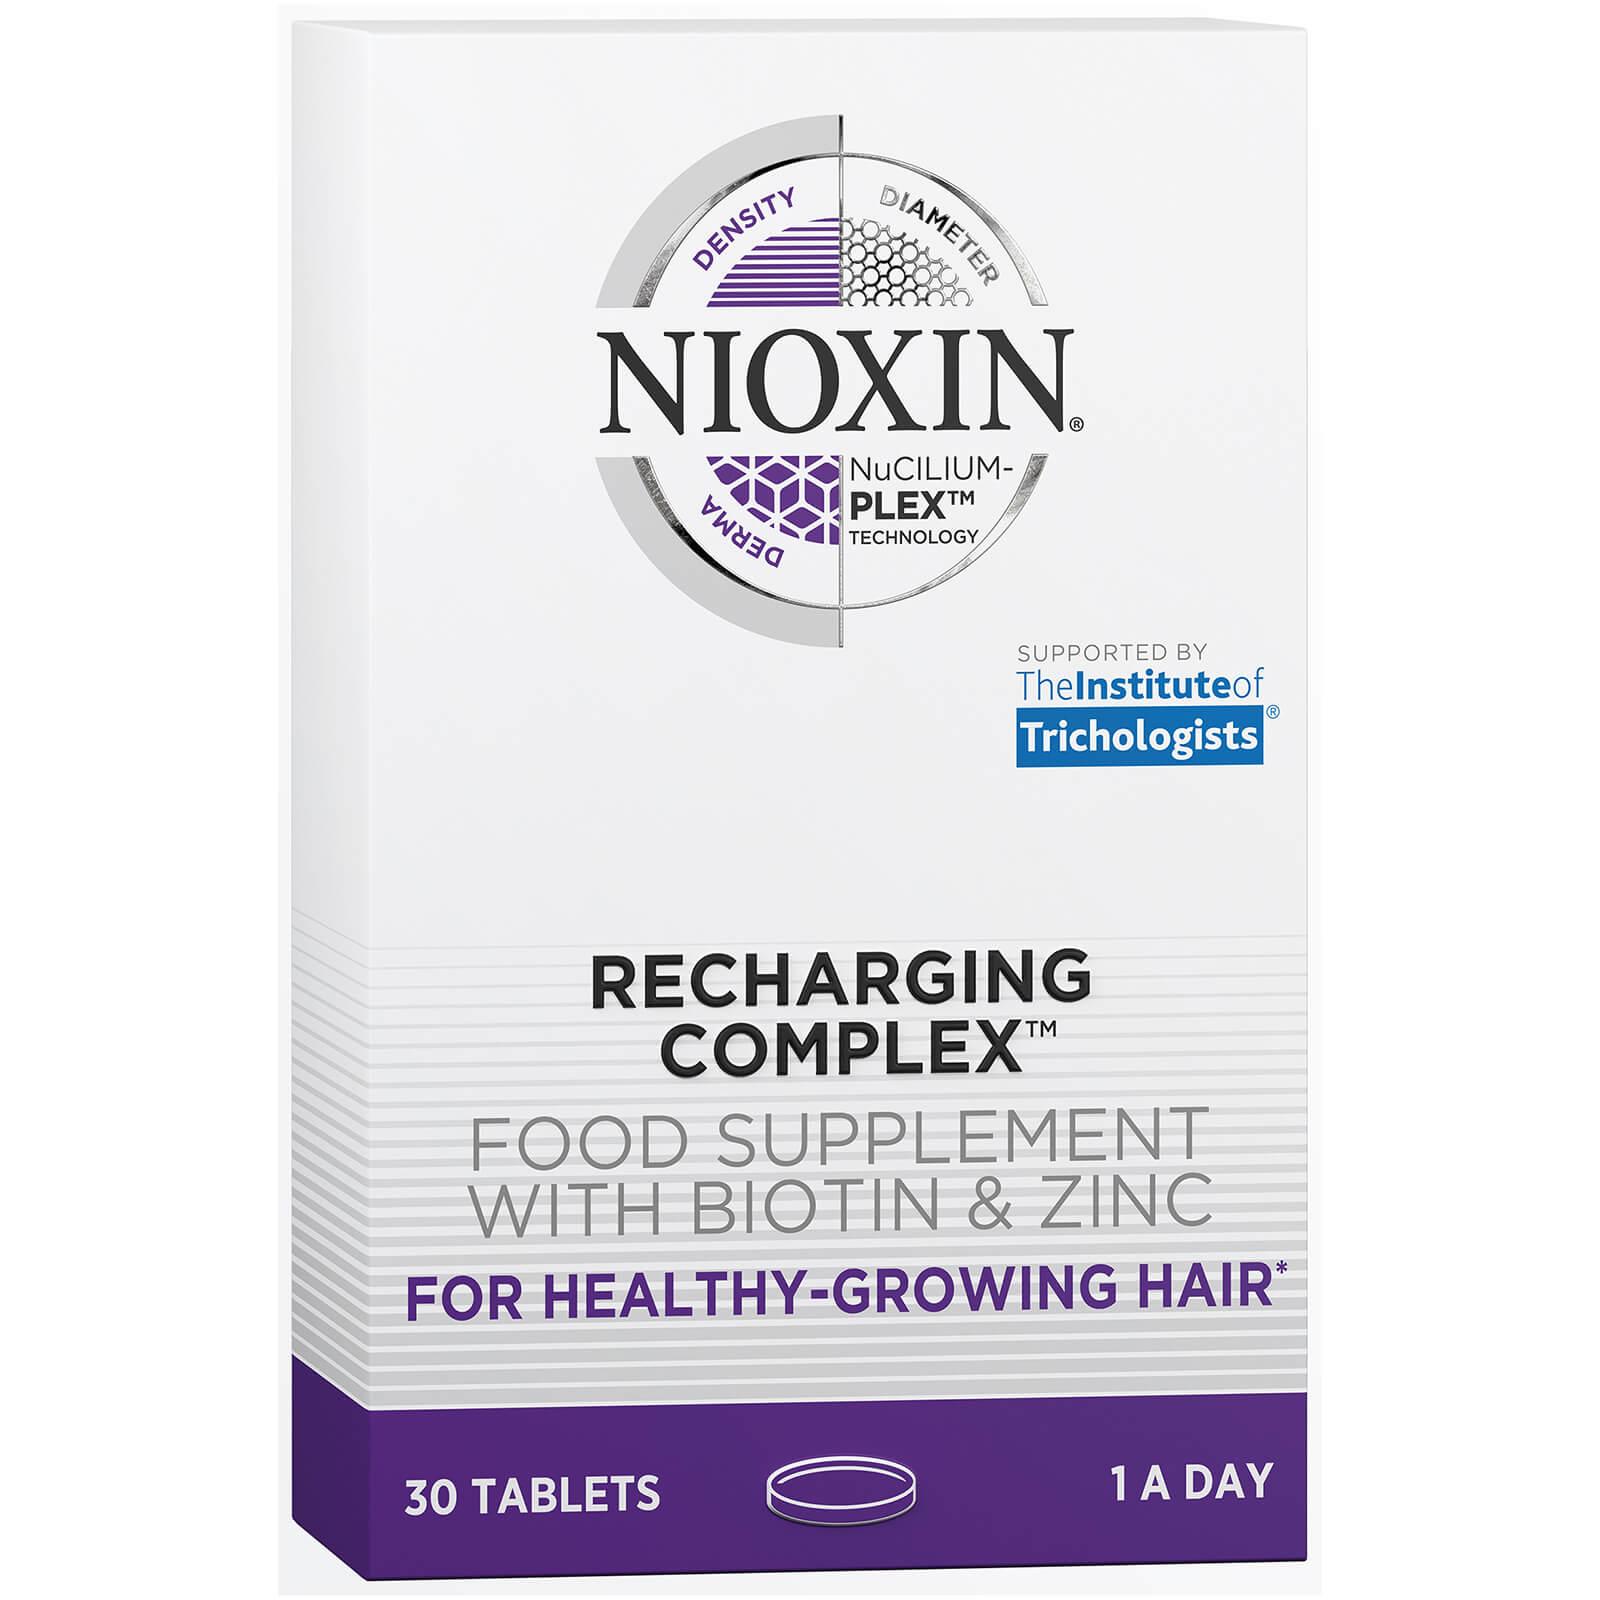 NIOXIN Recharging ComplexTM Food Supplement 30 Tablets